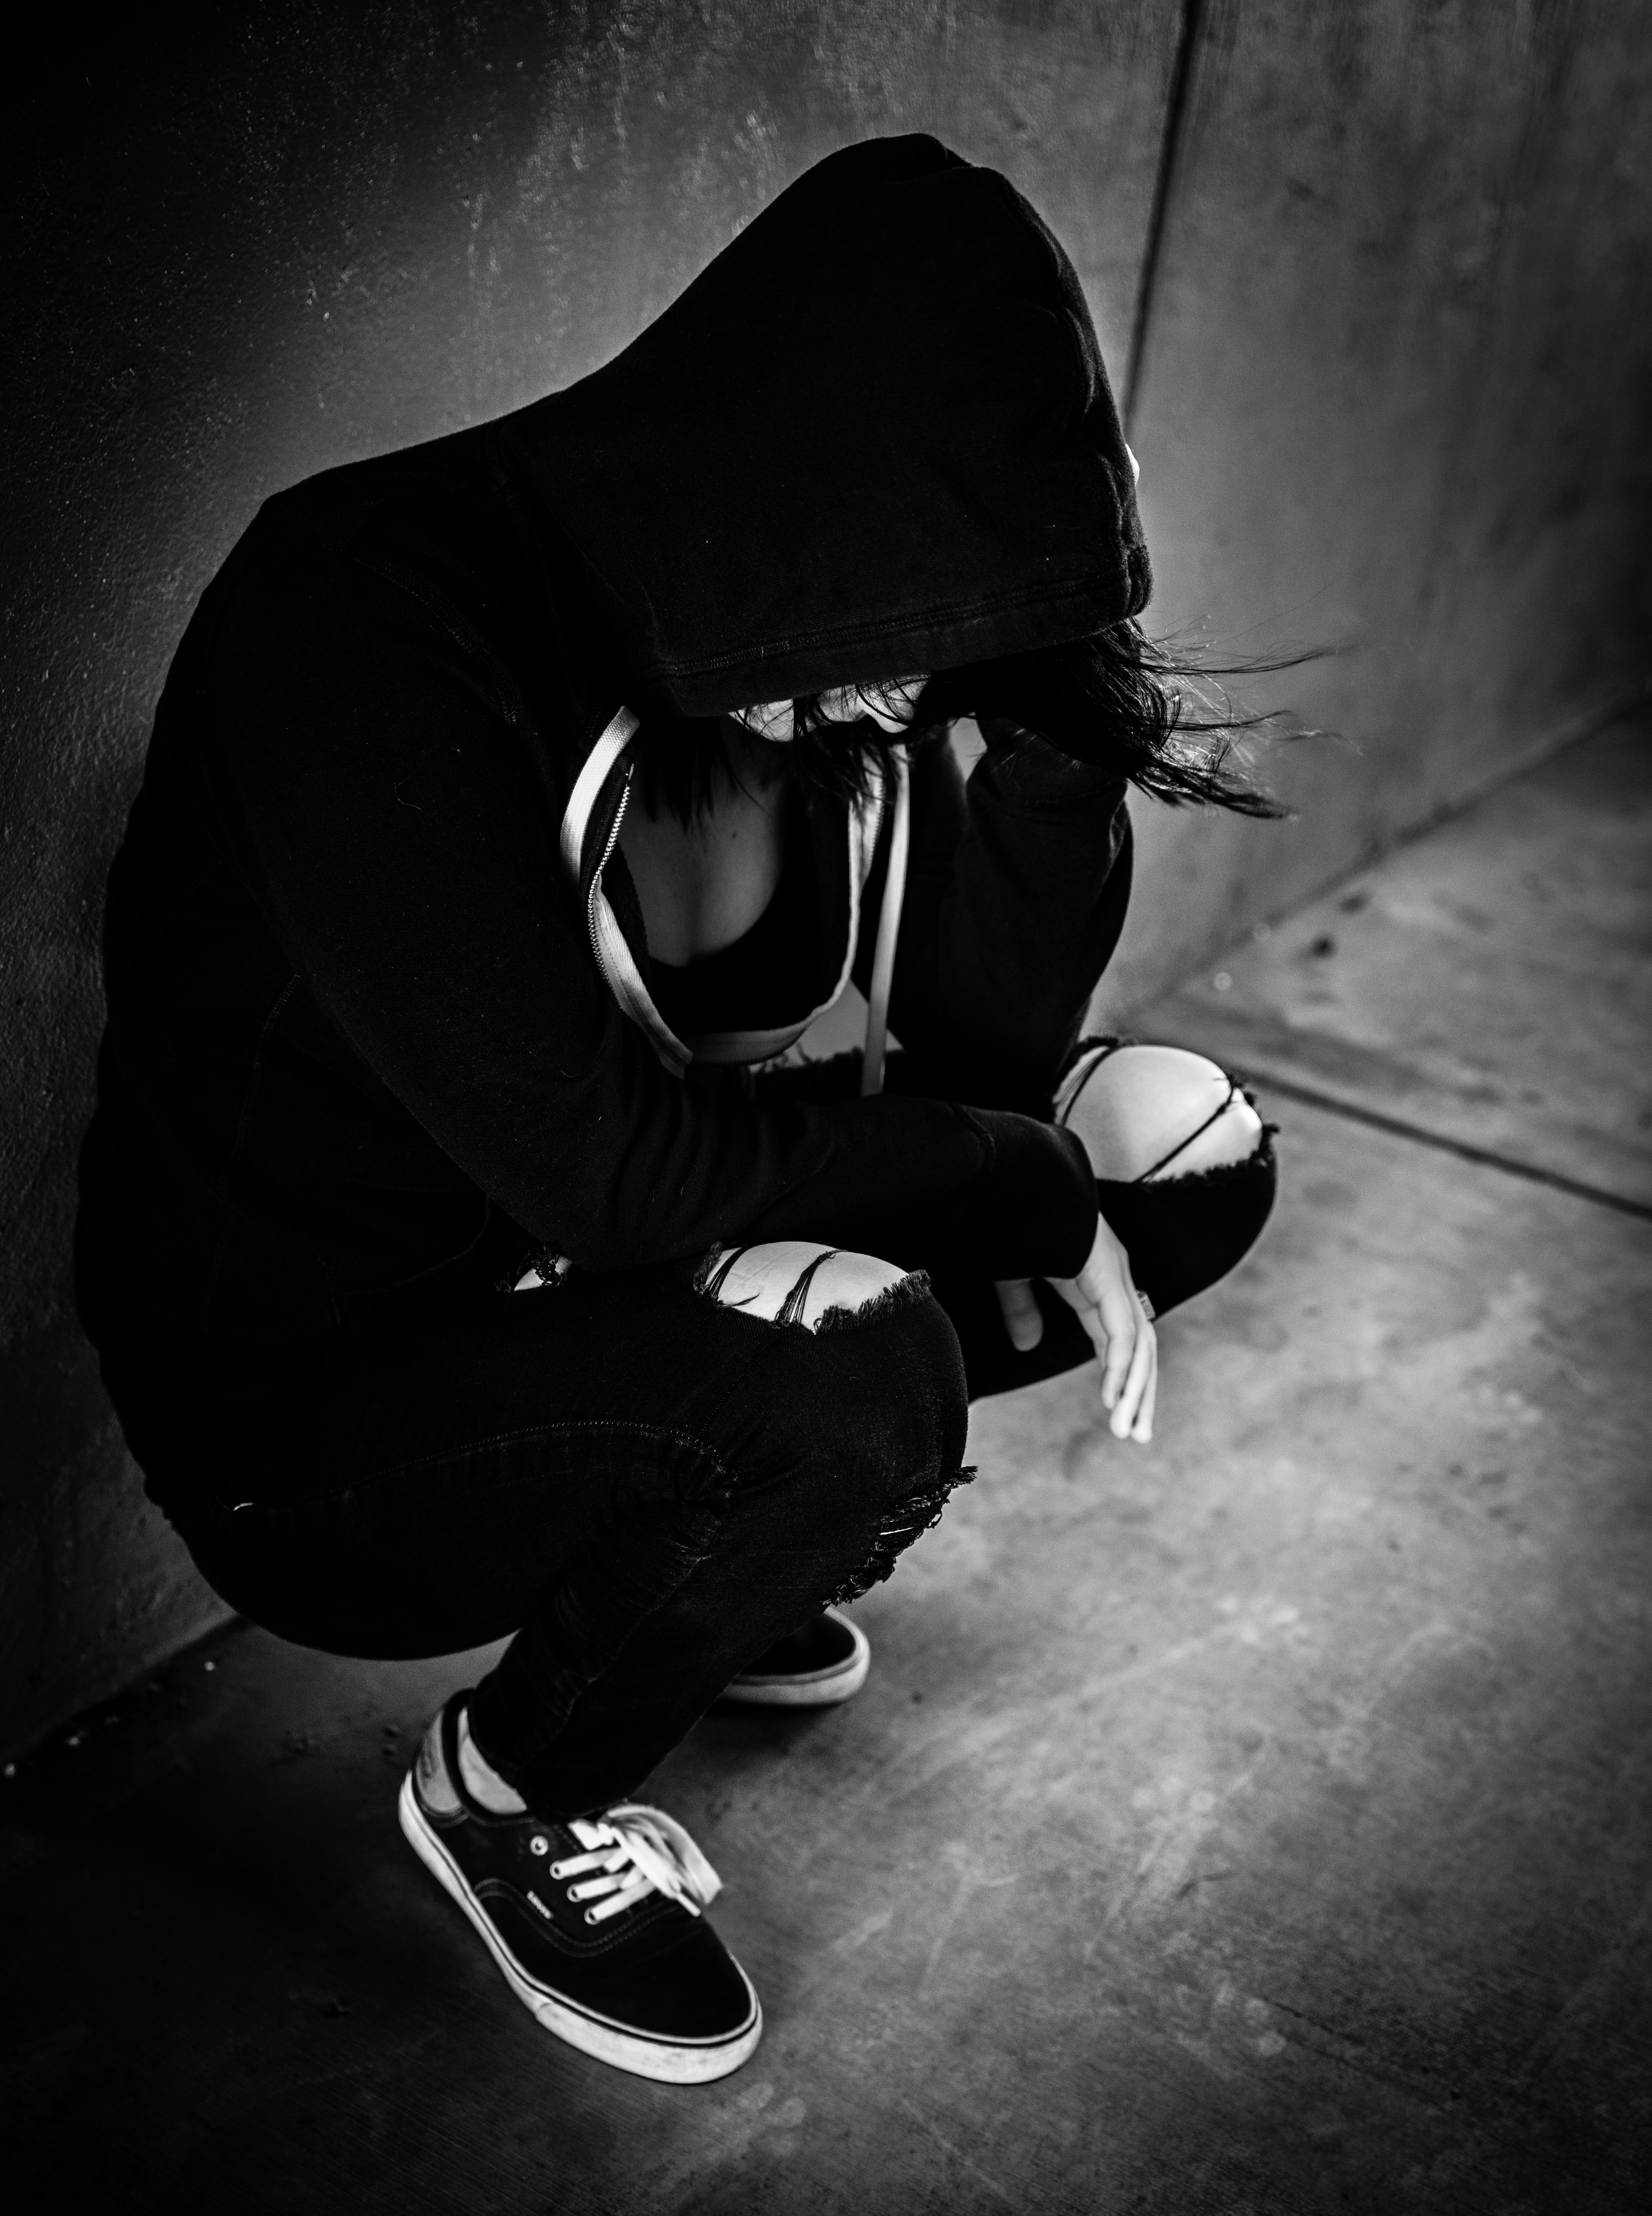 Him... heartbreak stories